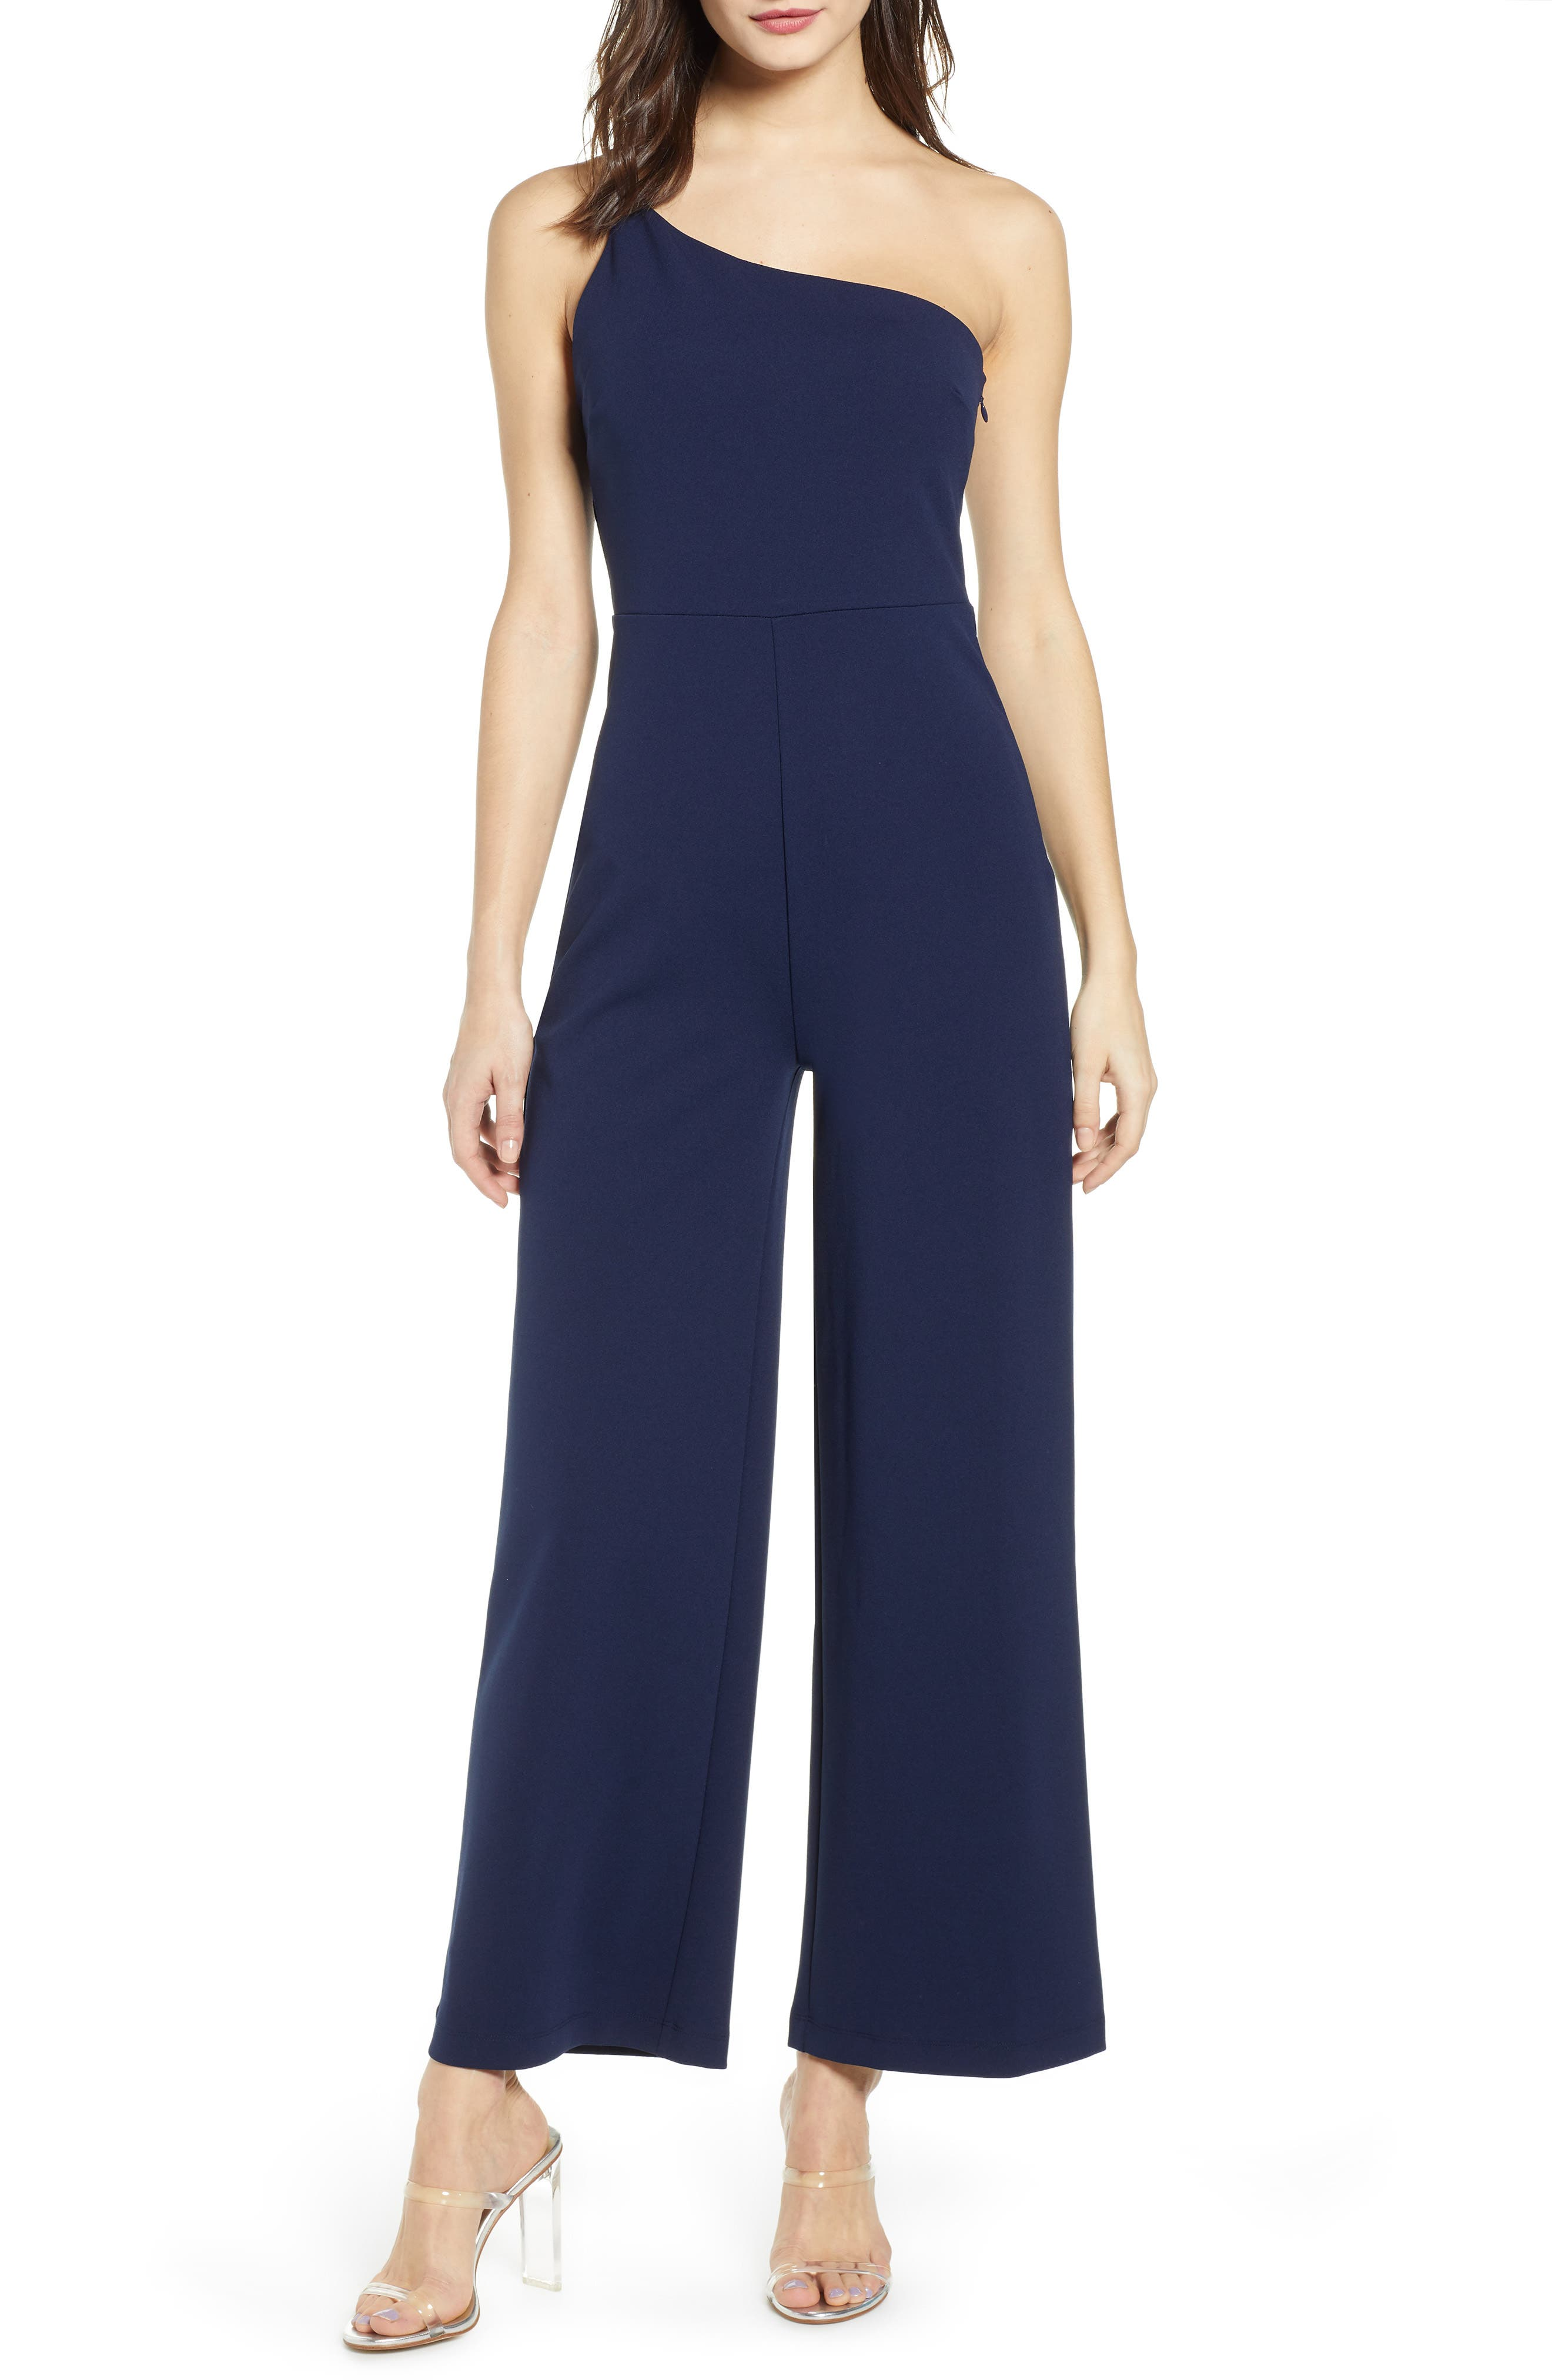 a93e3b82427a4 Women's Leith Dresses | Nordstrom